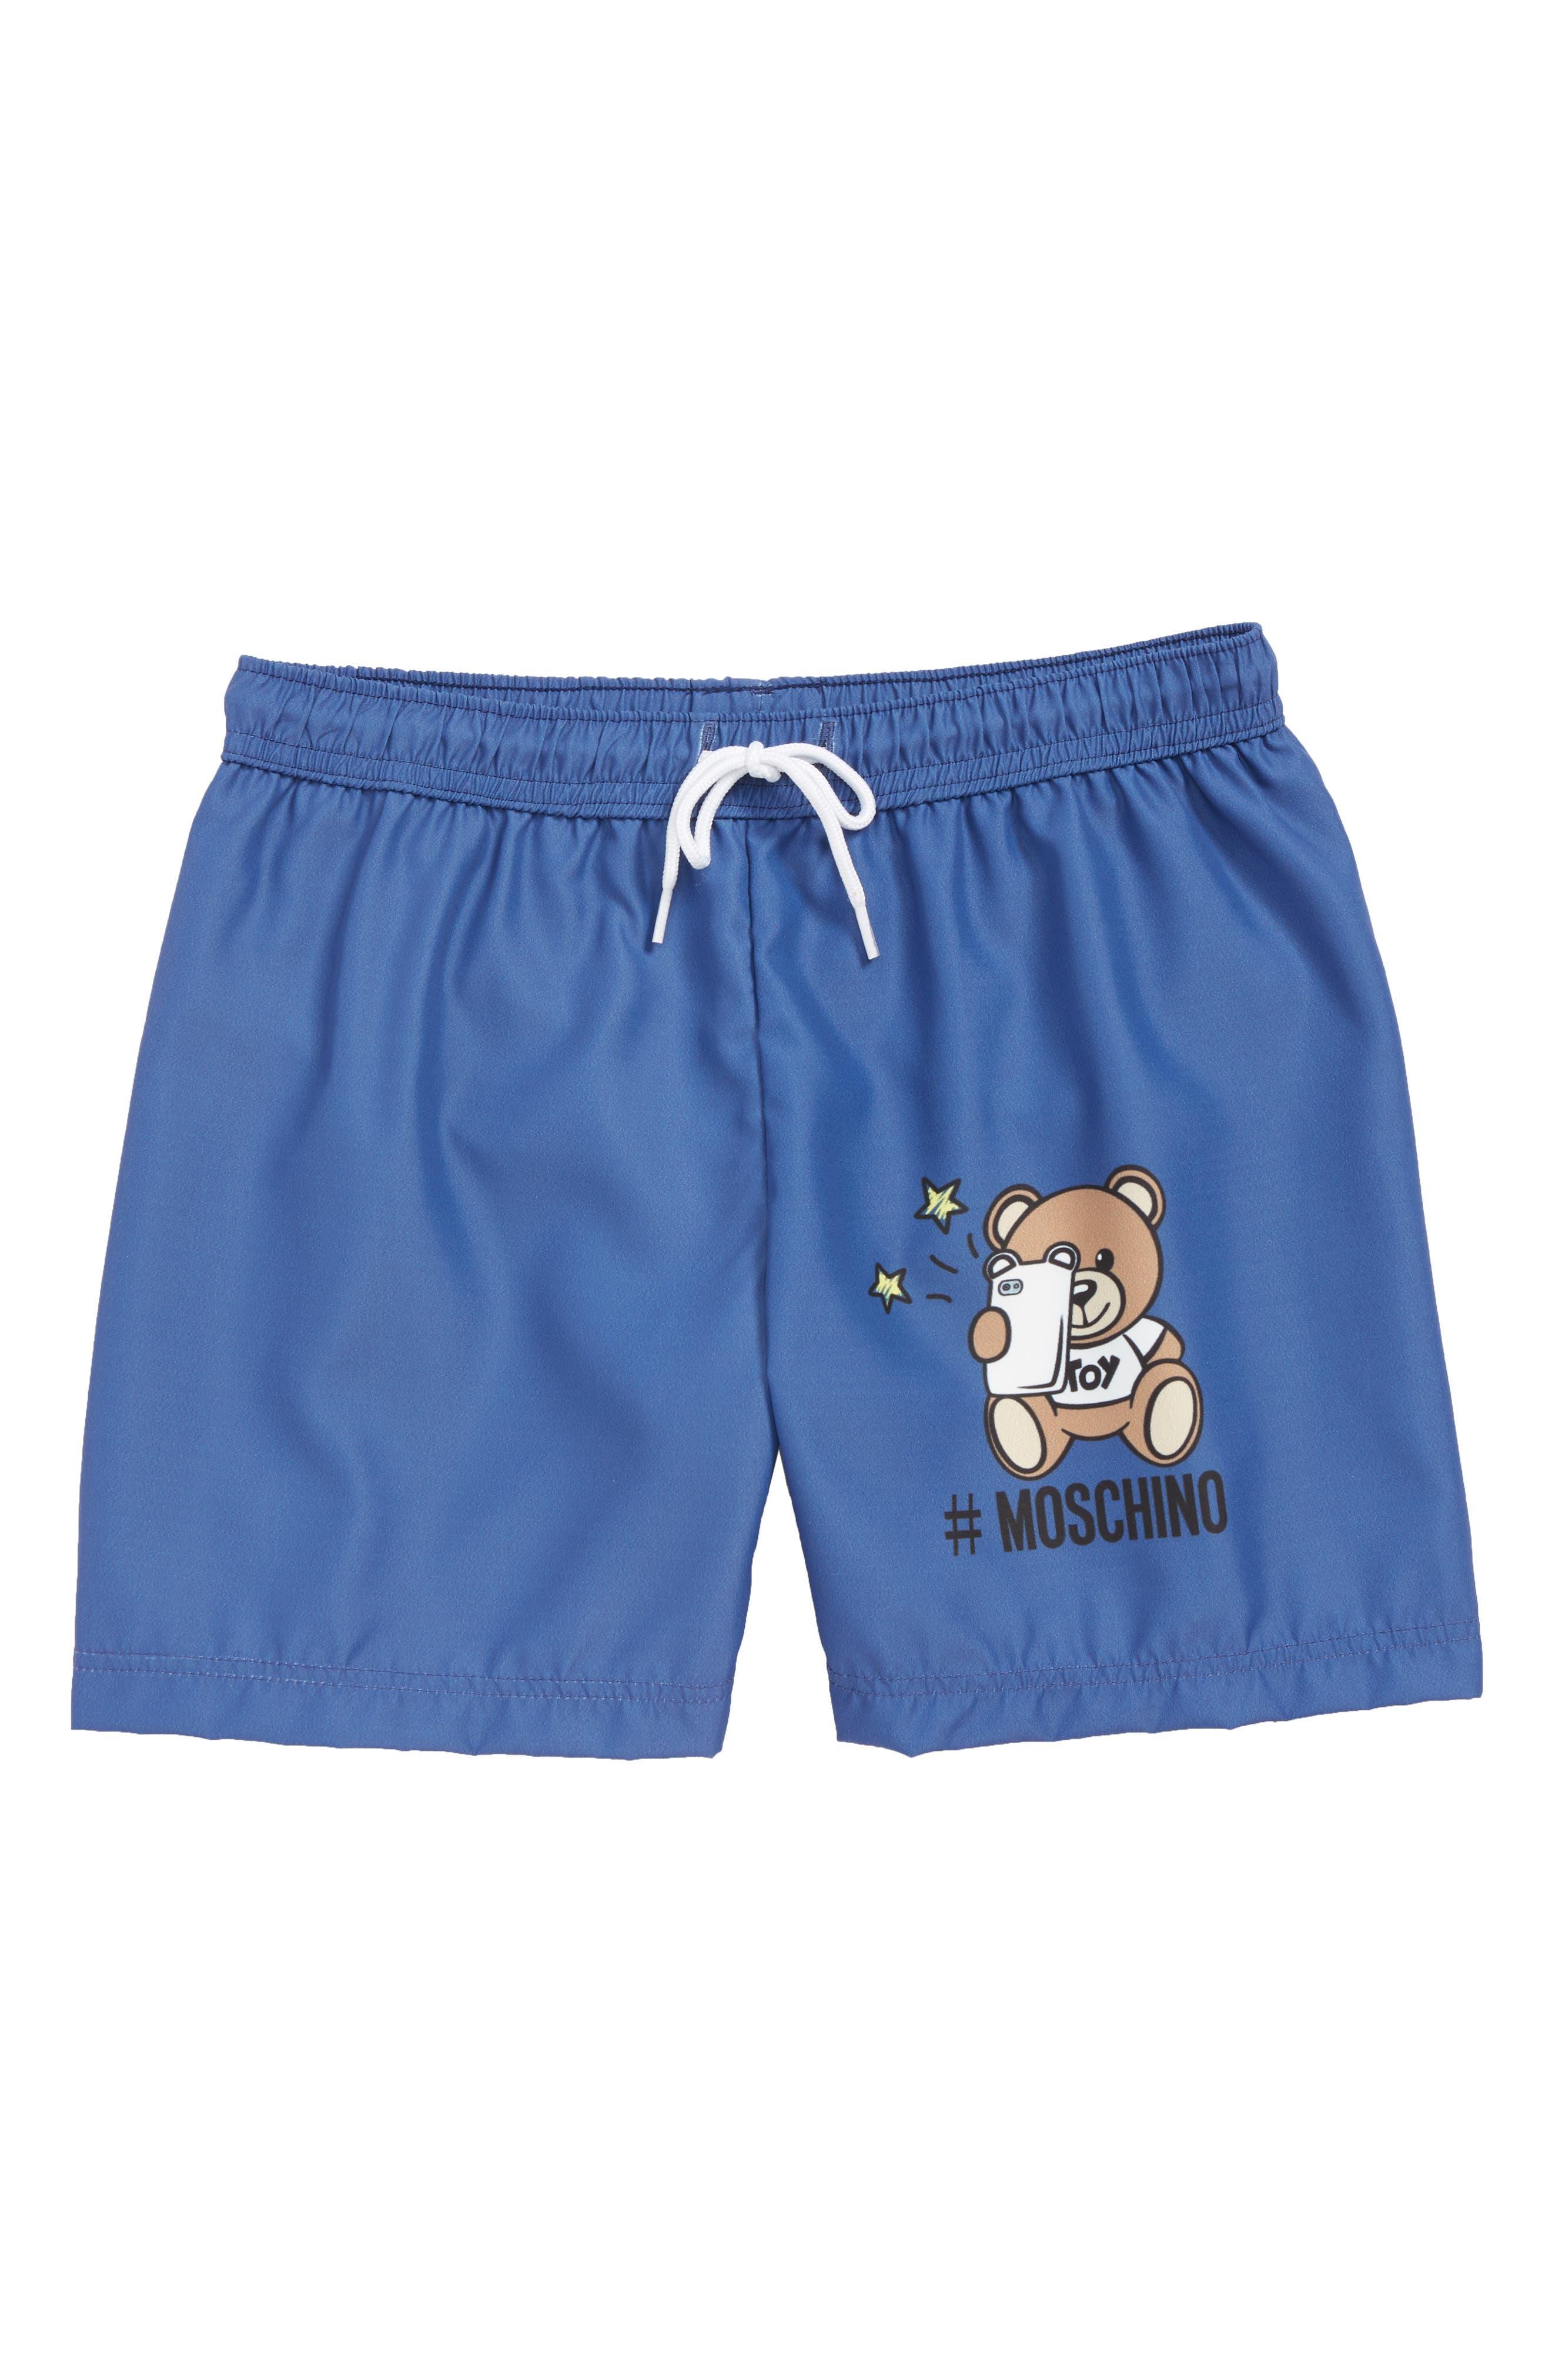 MOSCHINO Logo Bear Graphic Board Shorts, Main, color, NAVY